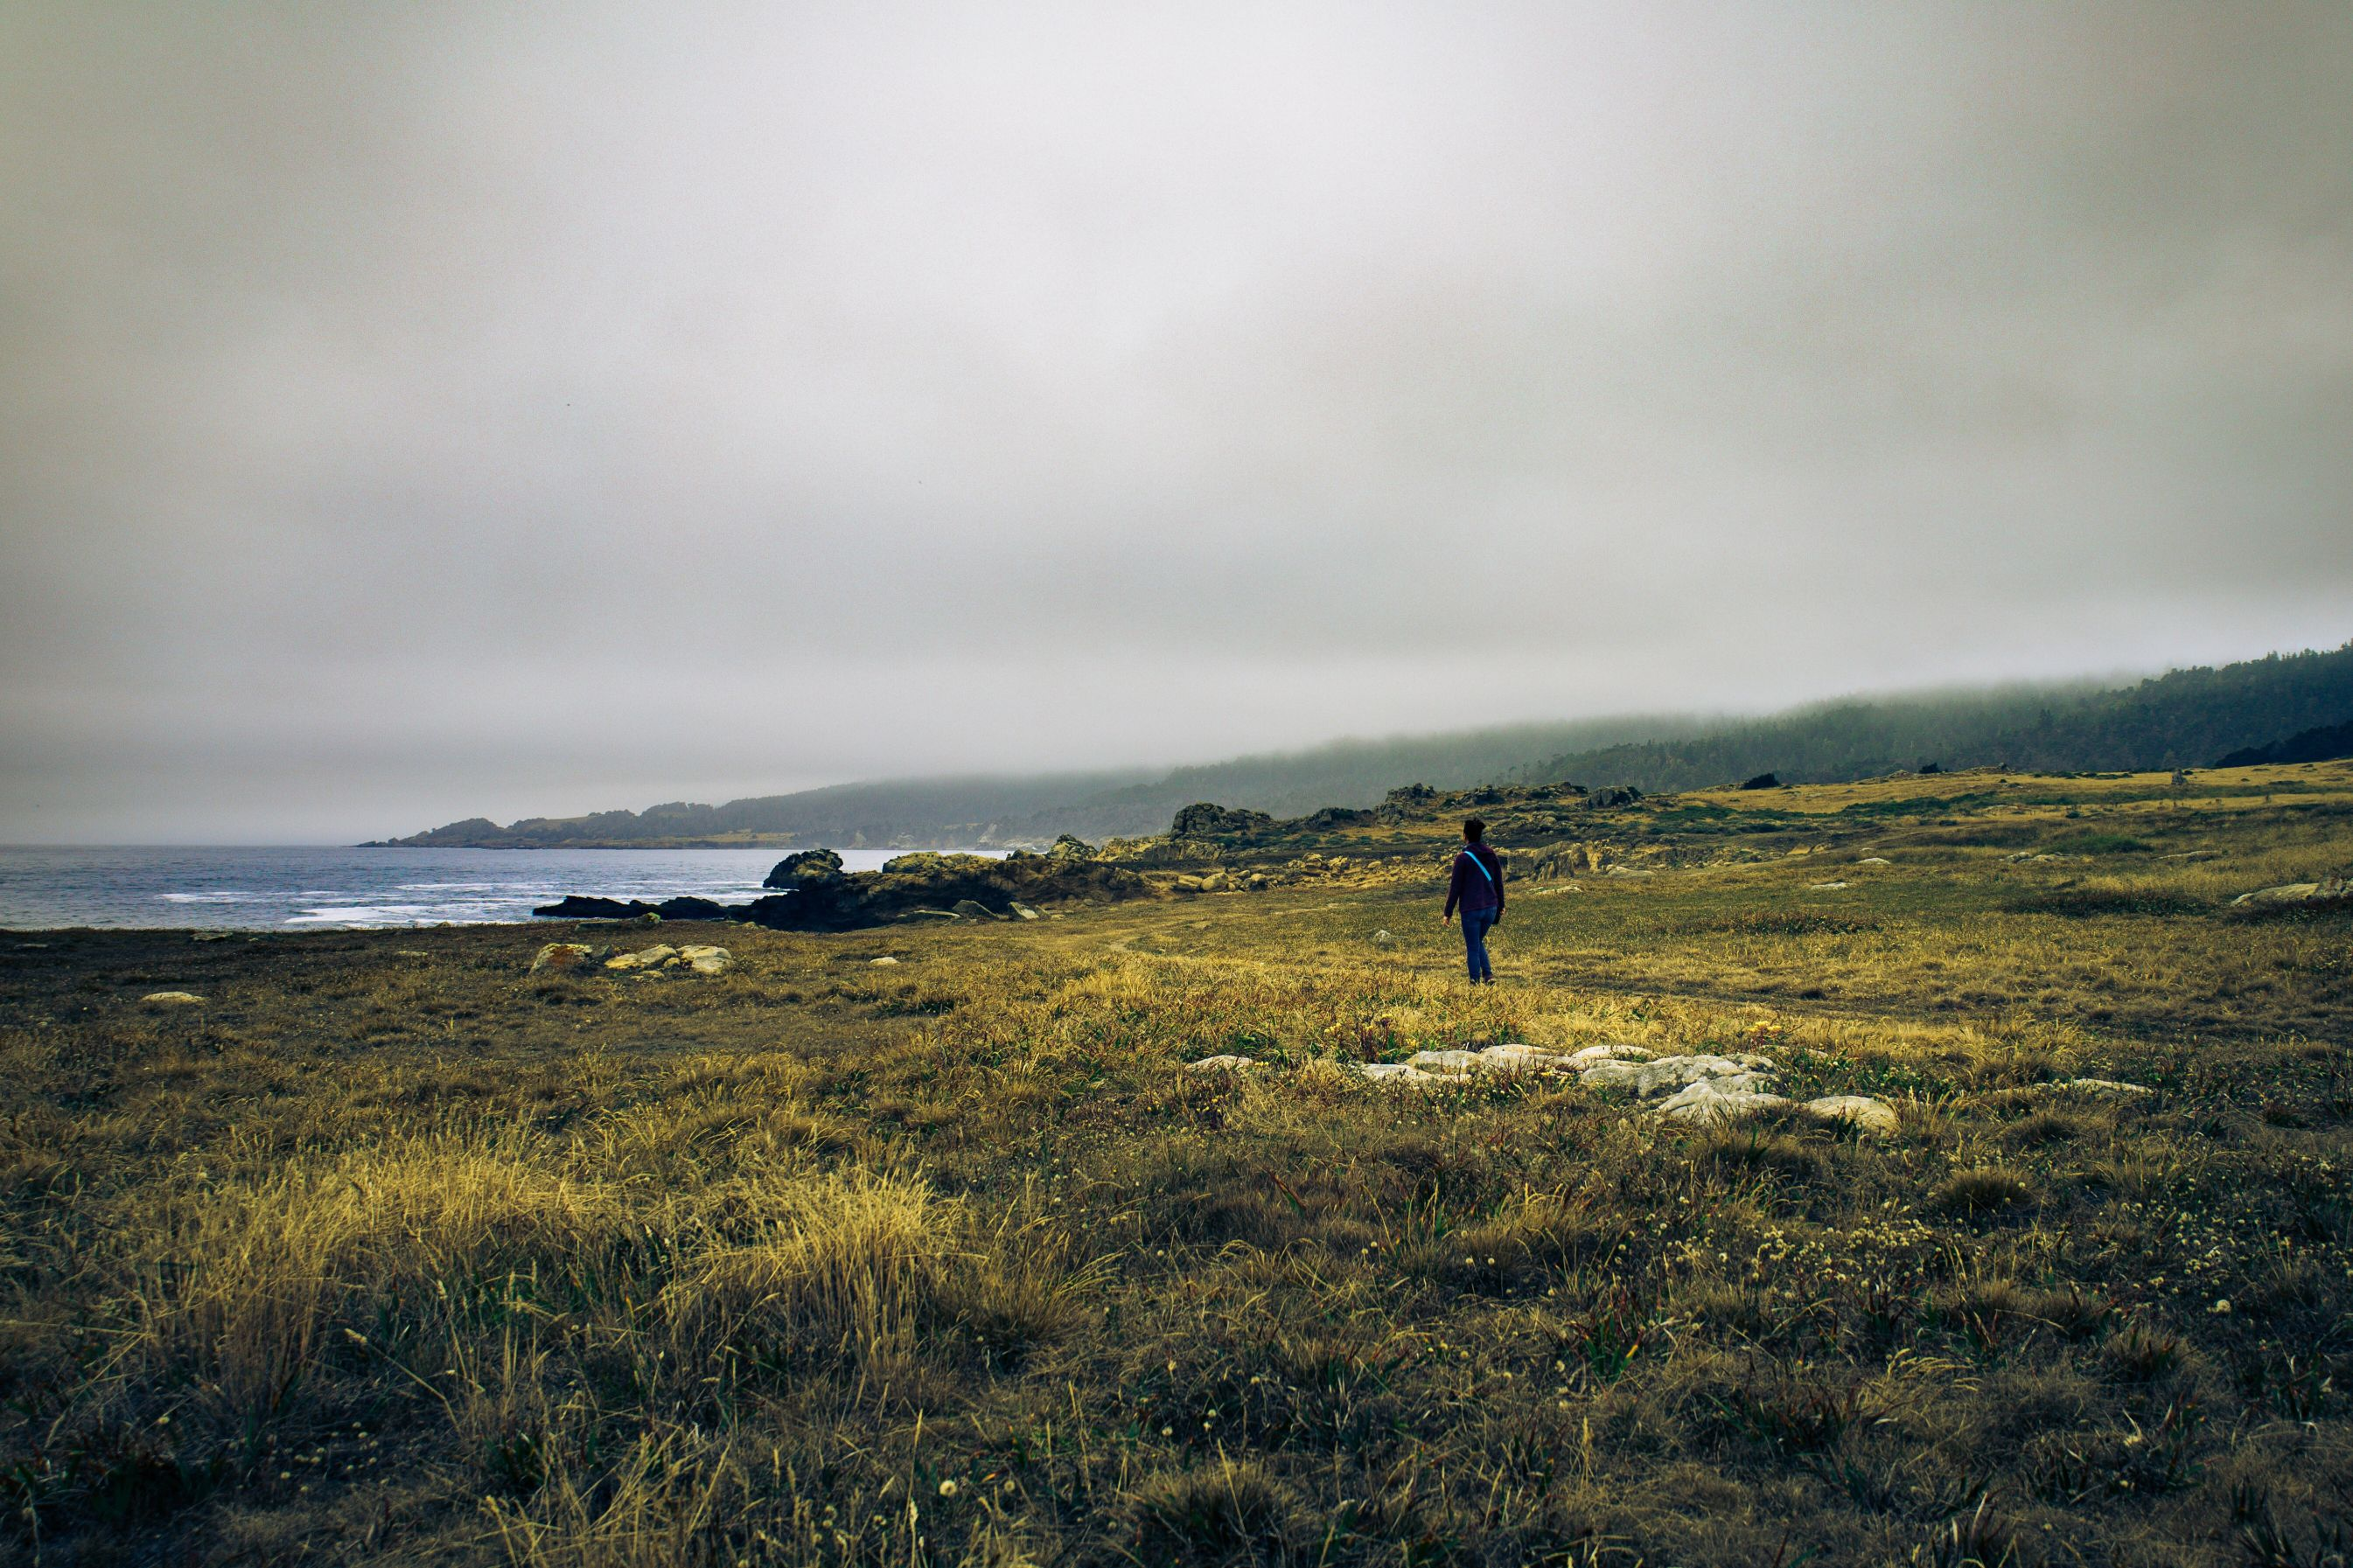 Alone on the Foggy Coast